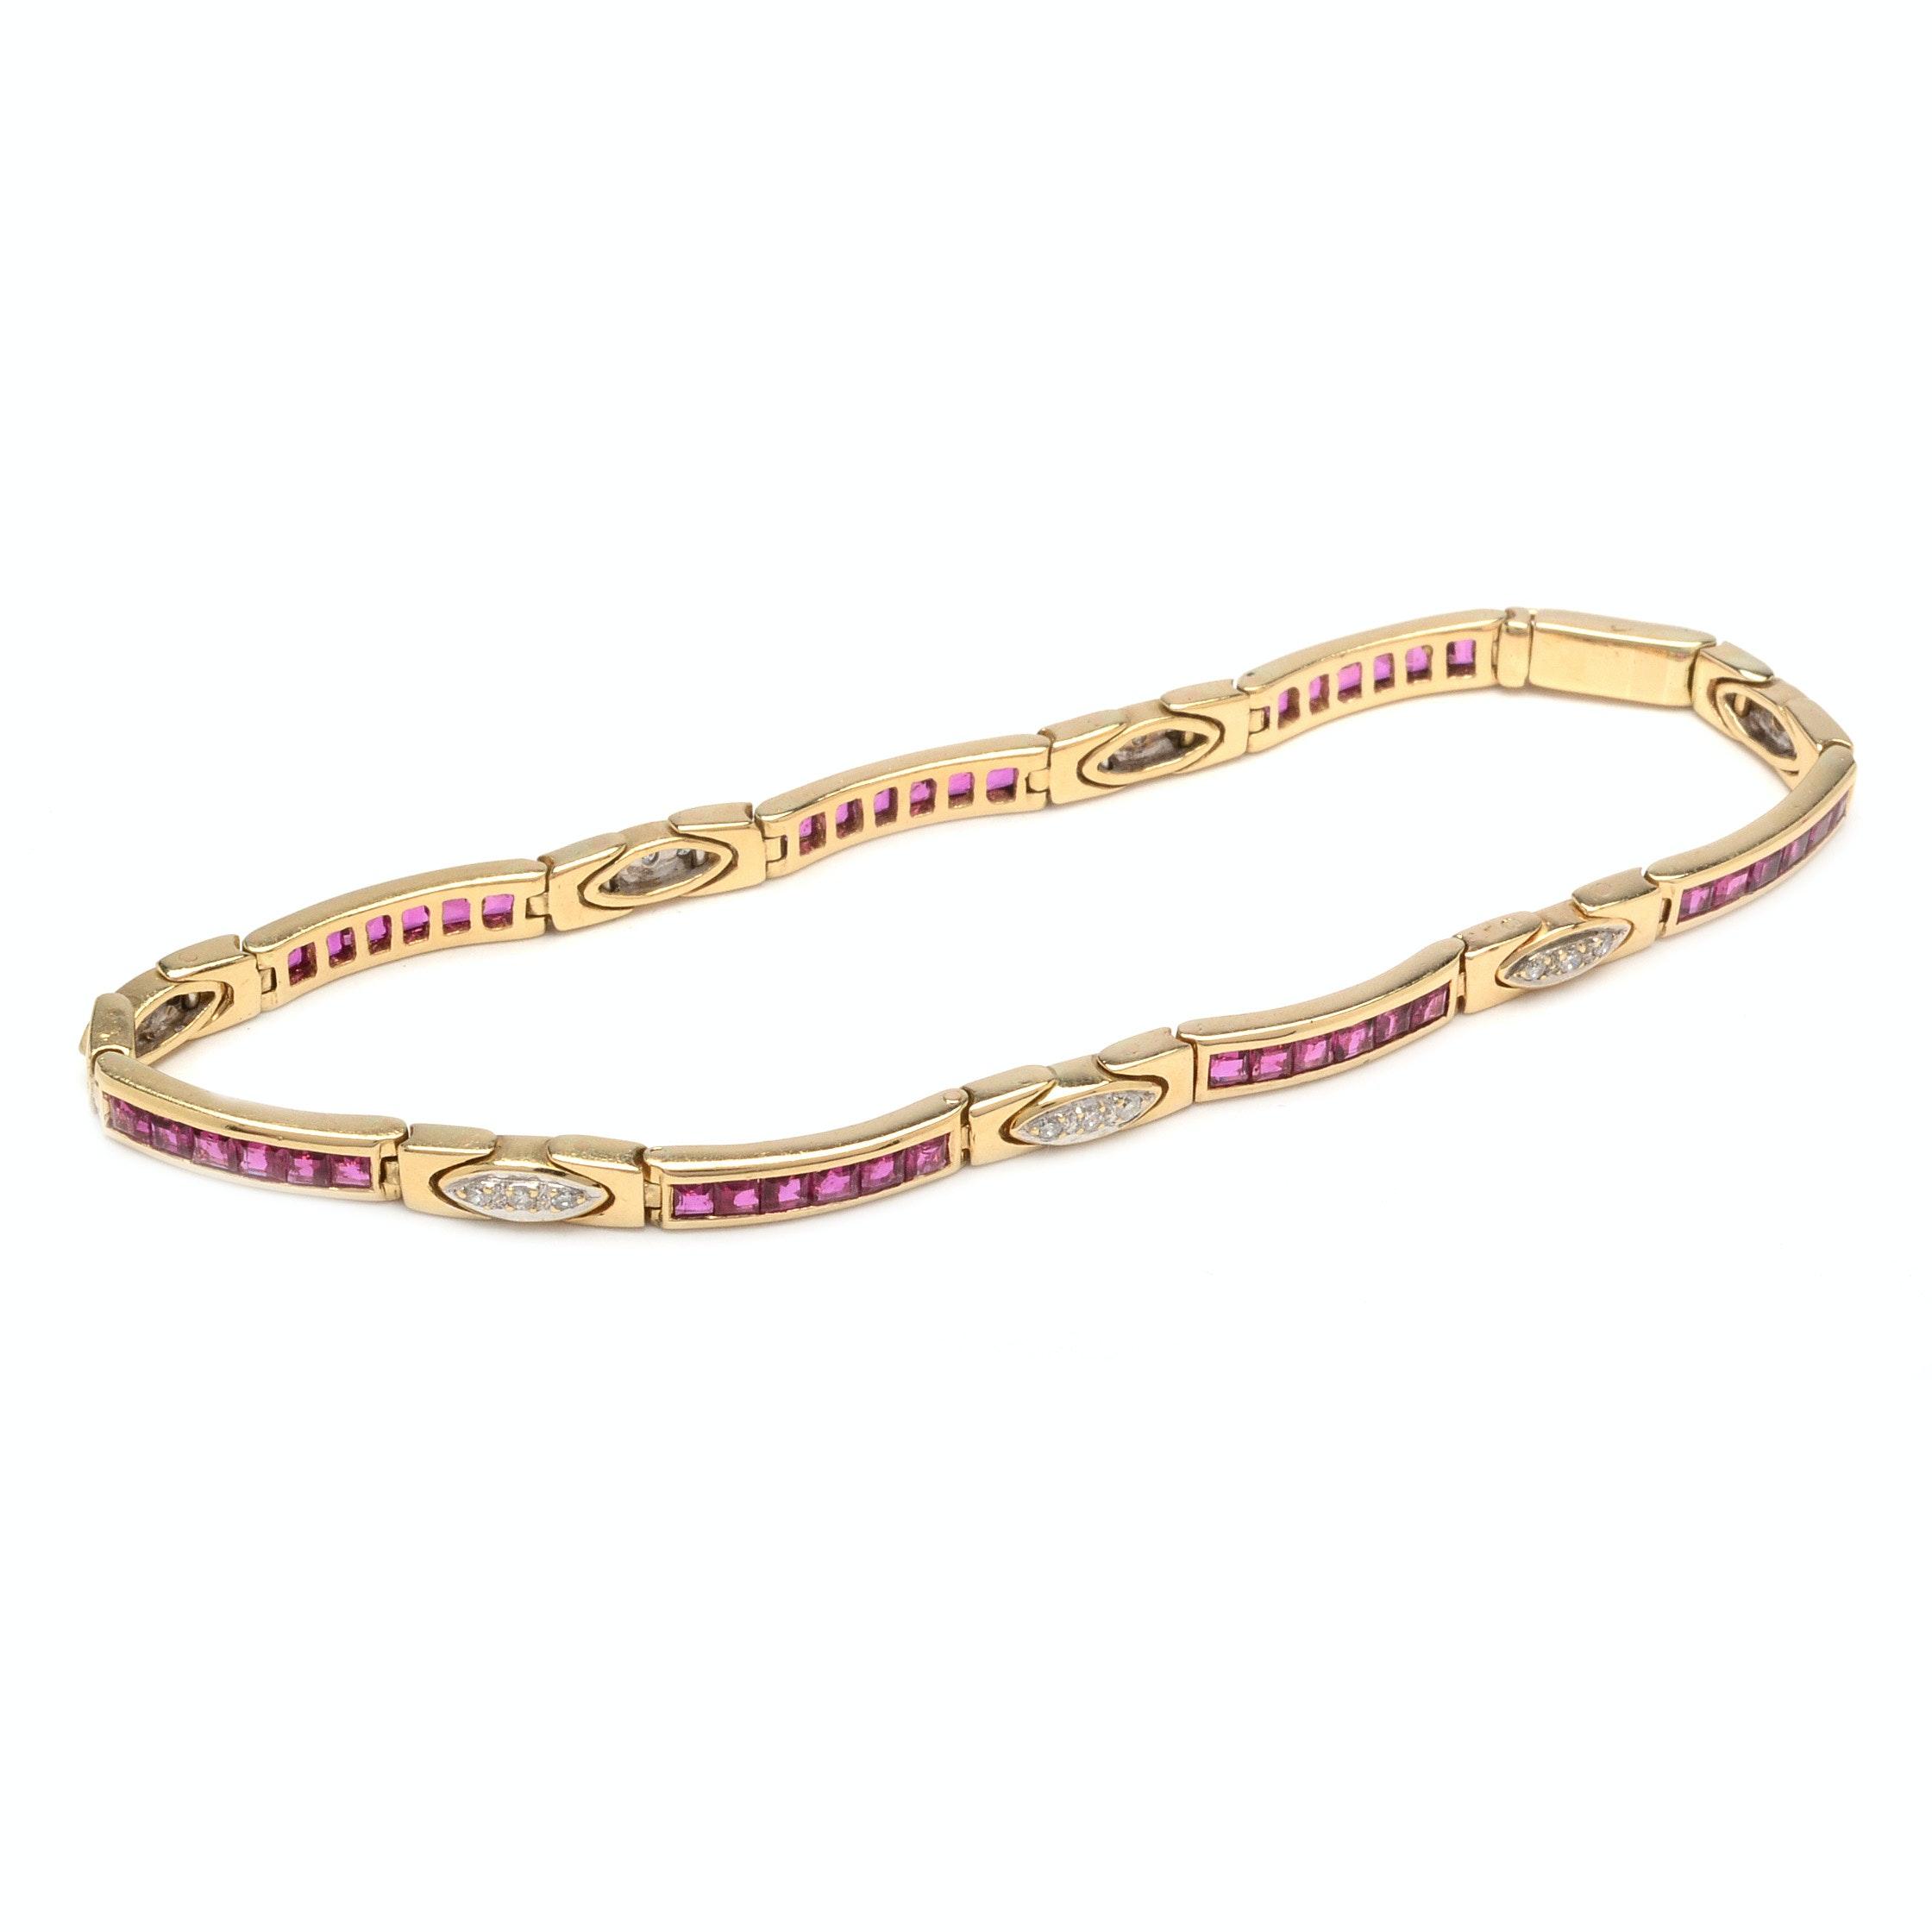 14K Yellow Gold French Cut Ruby and Diamond Bracelet